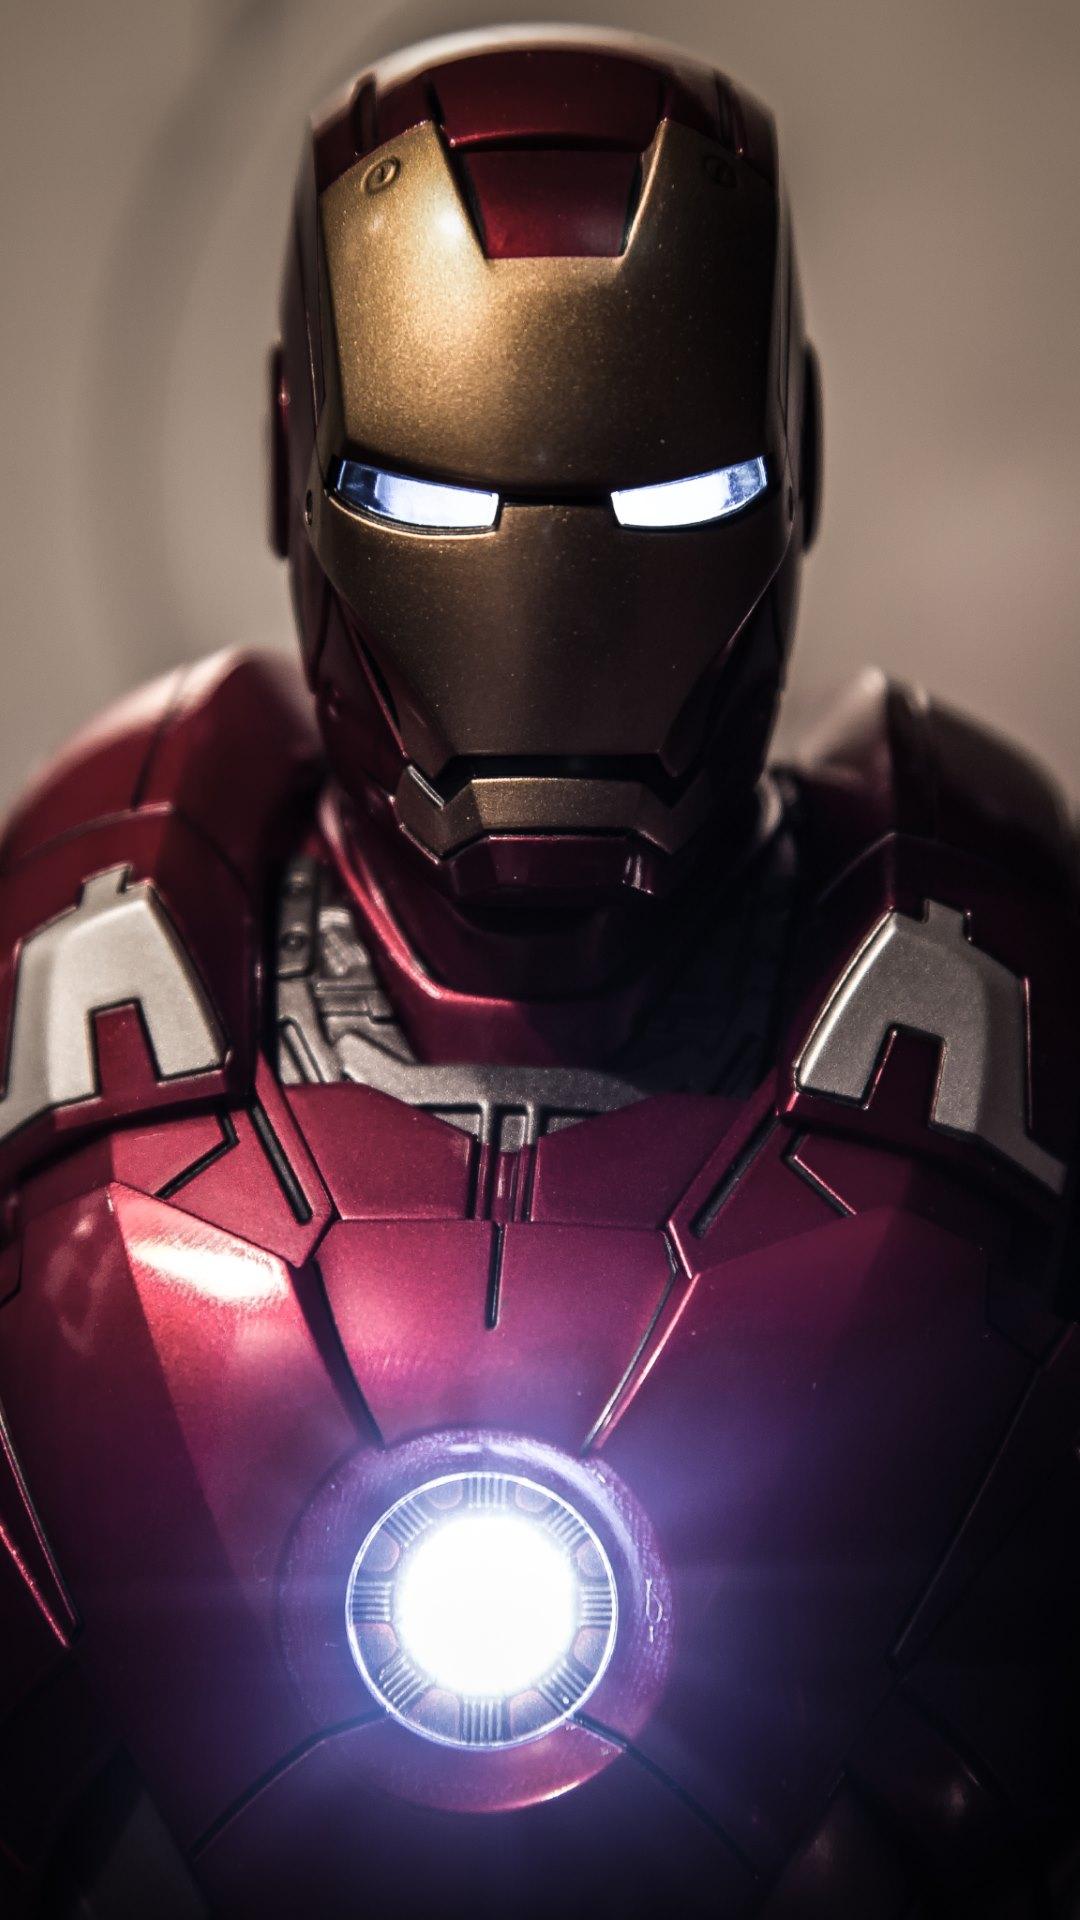 Iron Man Wolverine Captain America Hulk 1080x1920